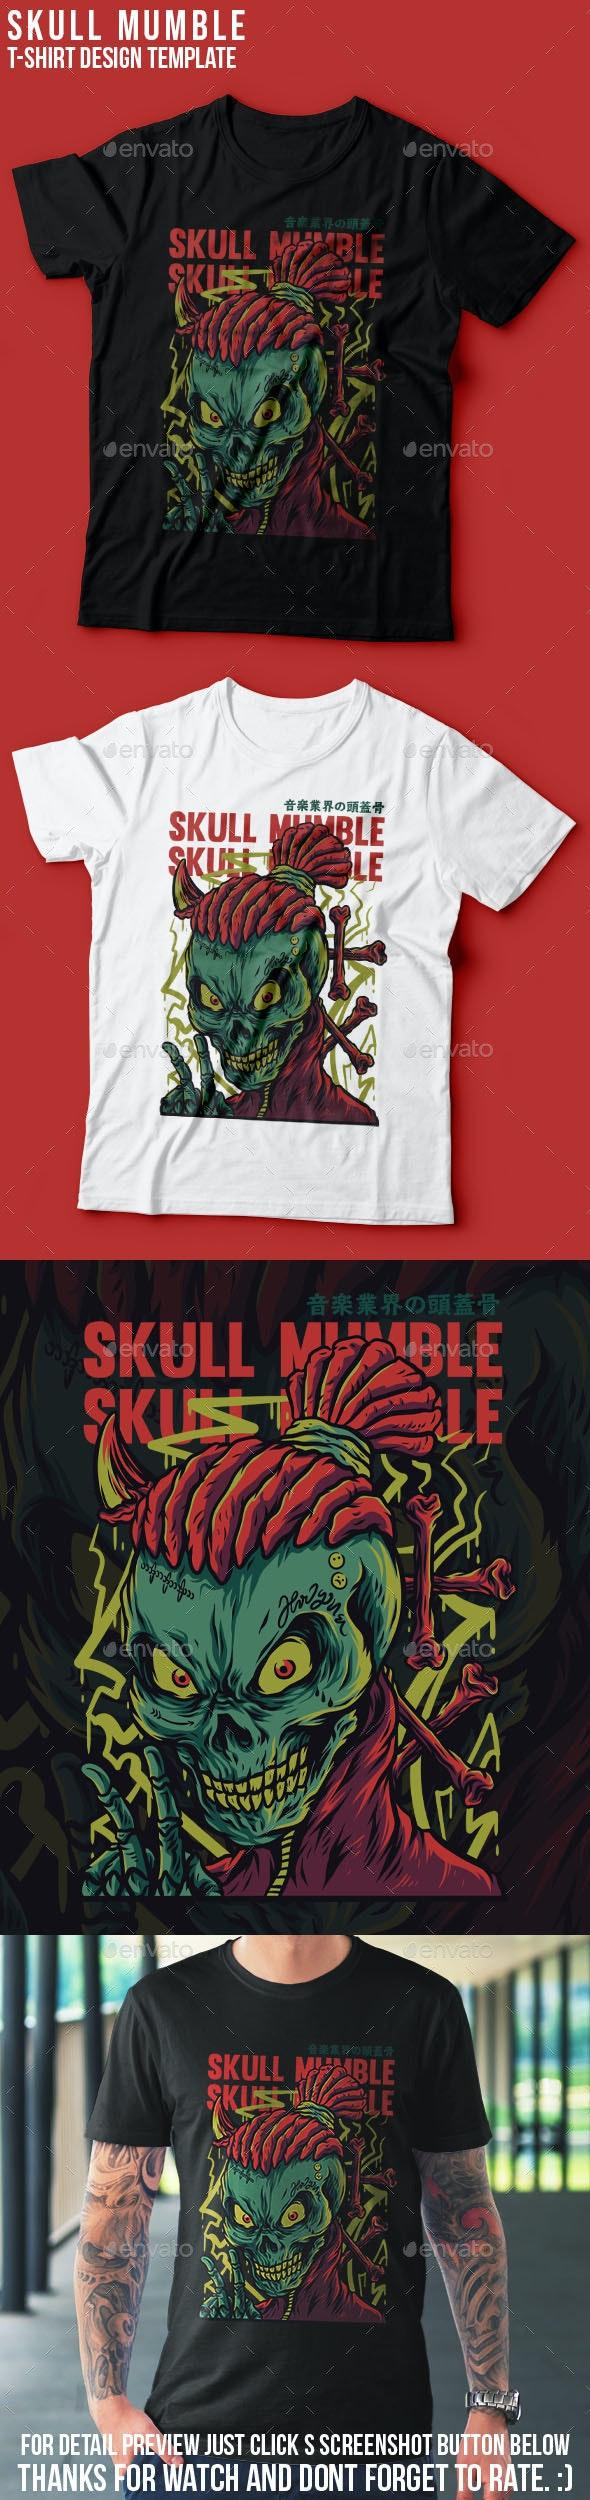 Skull Mumble T-Shirt Design - Events T-Shirts